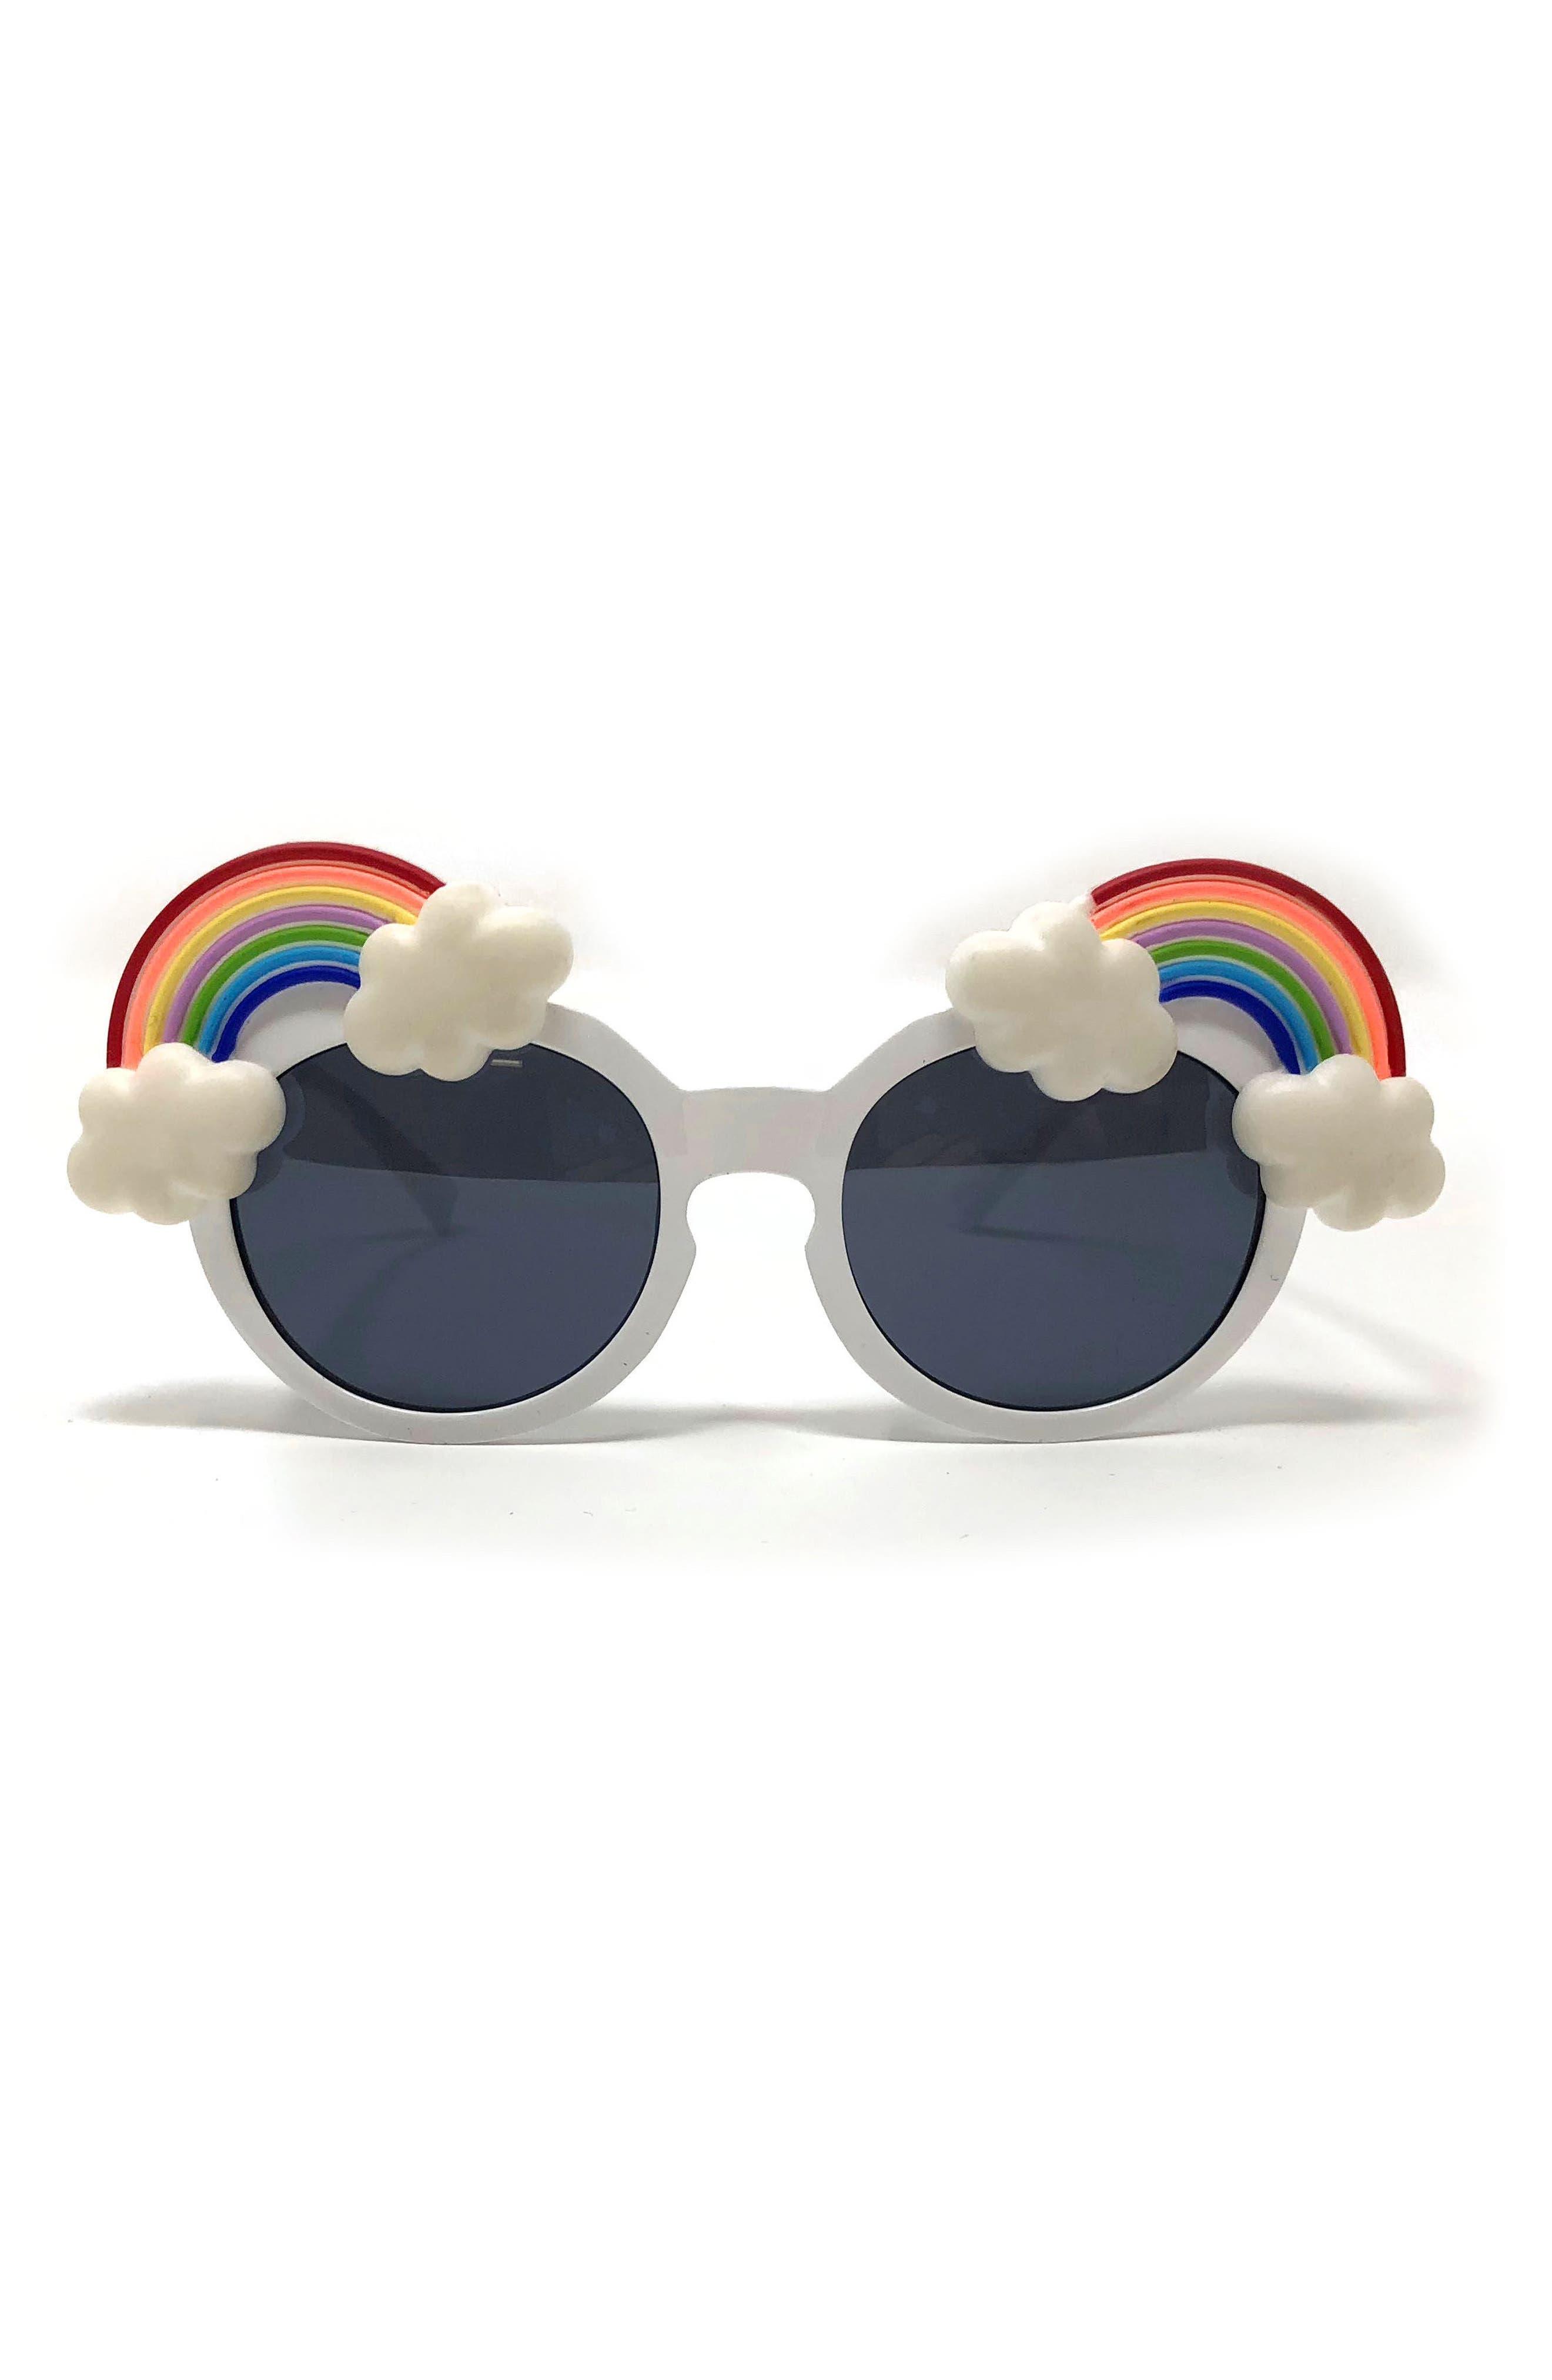 Loose Leaf Eyewear Small Round Rainbow Sunglasses (Toddler)